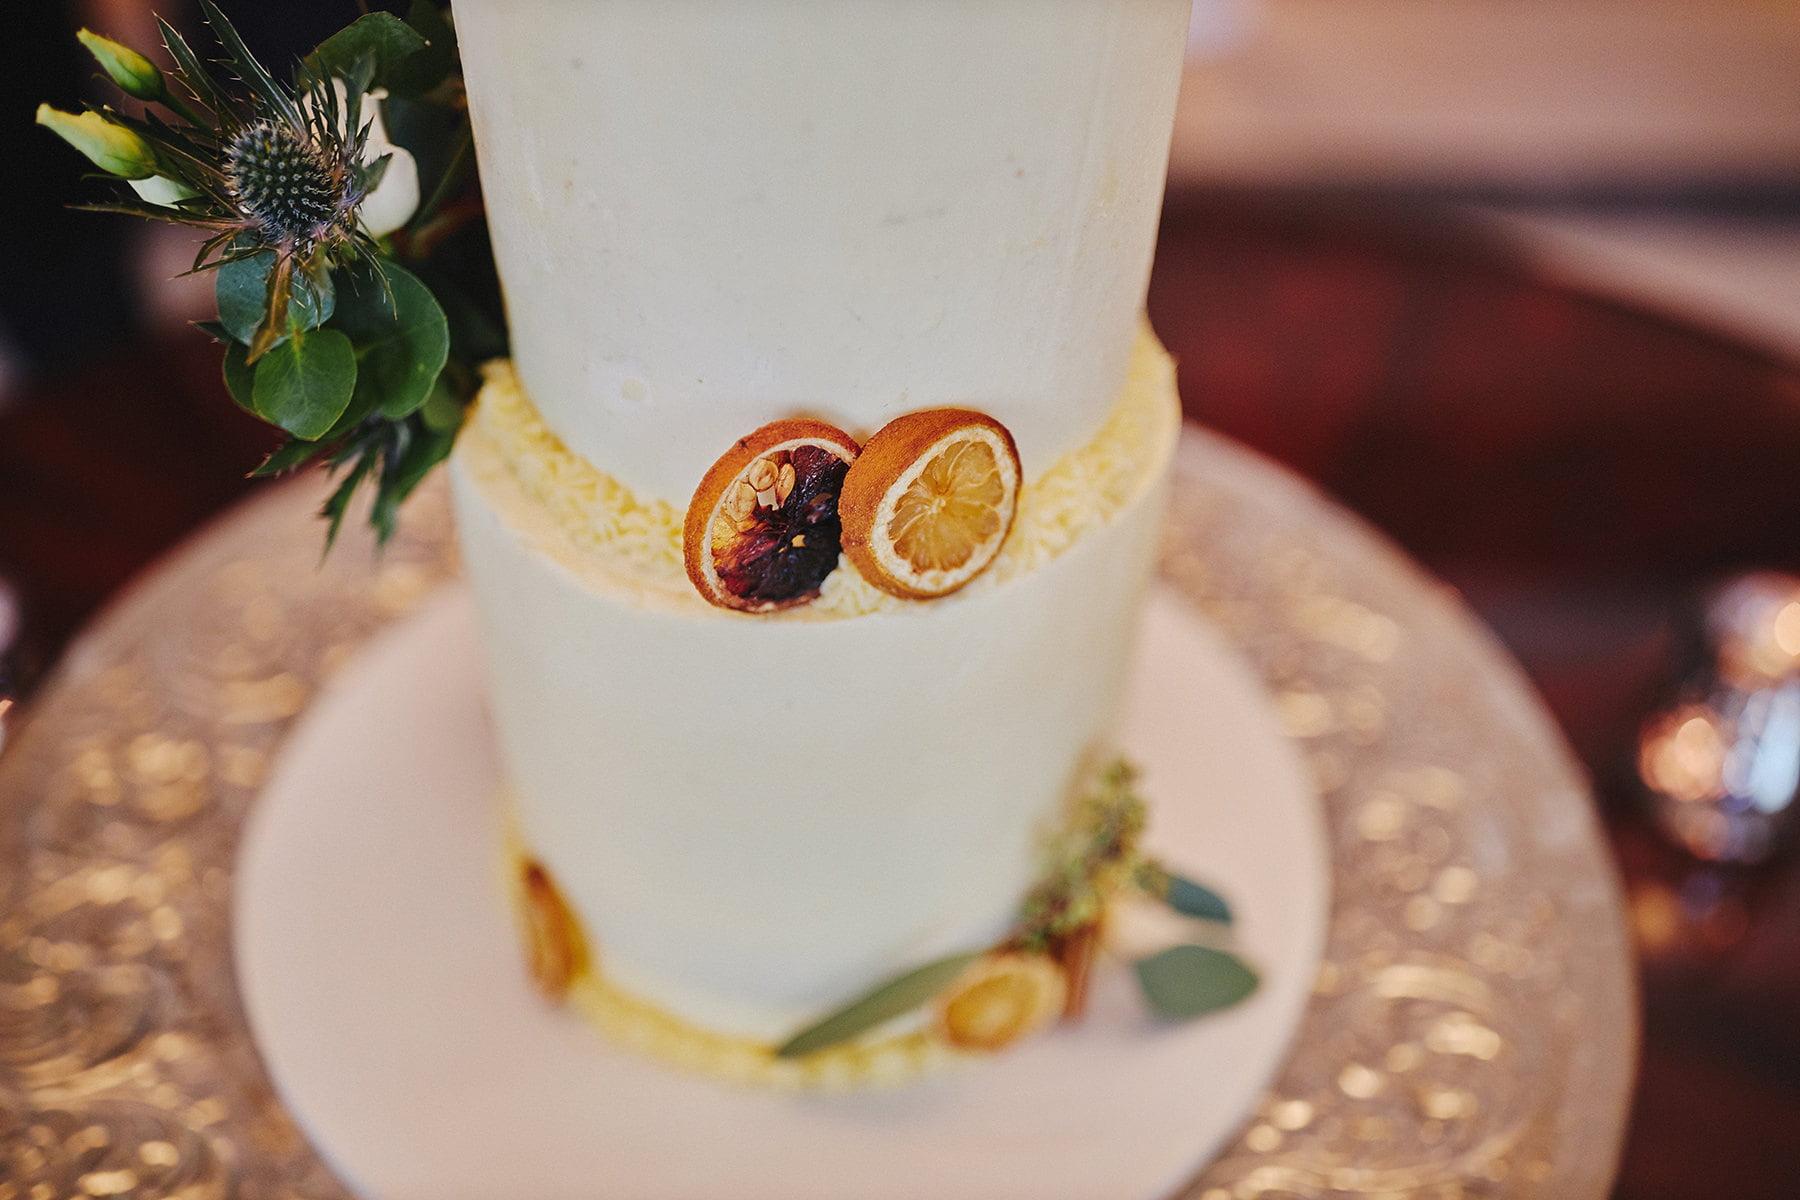 POWERSCOURT HOTEL RESORT INTIMATE WEDDING 31